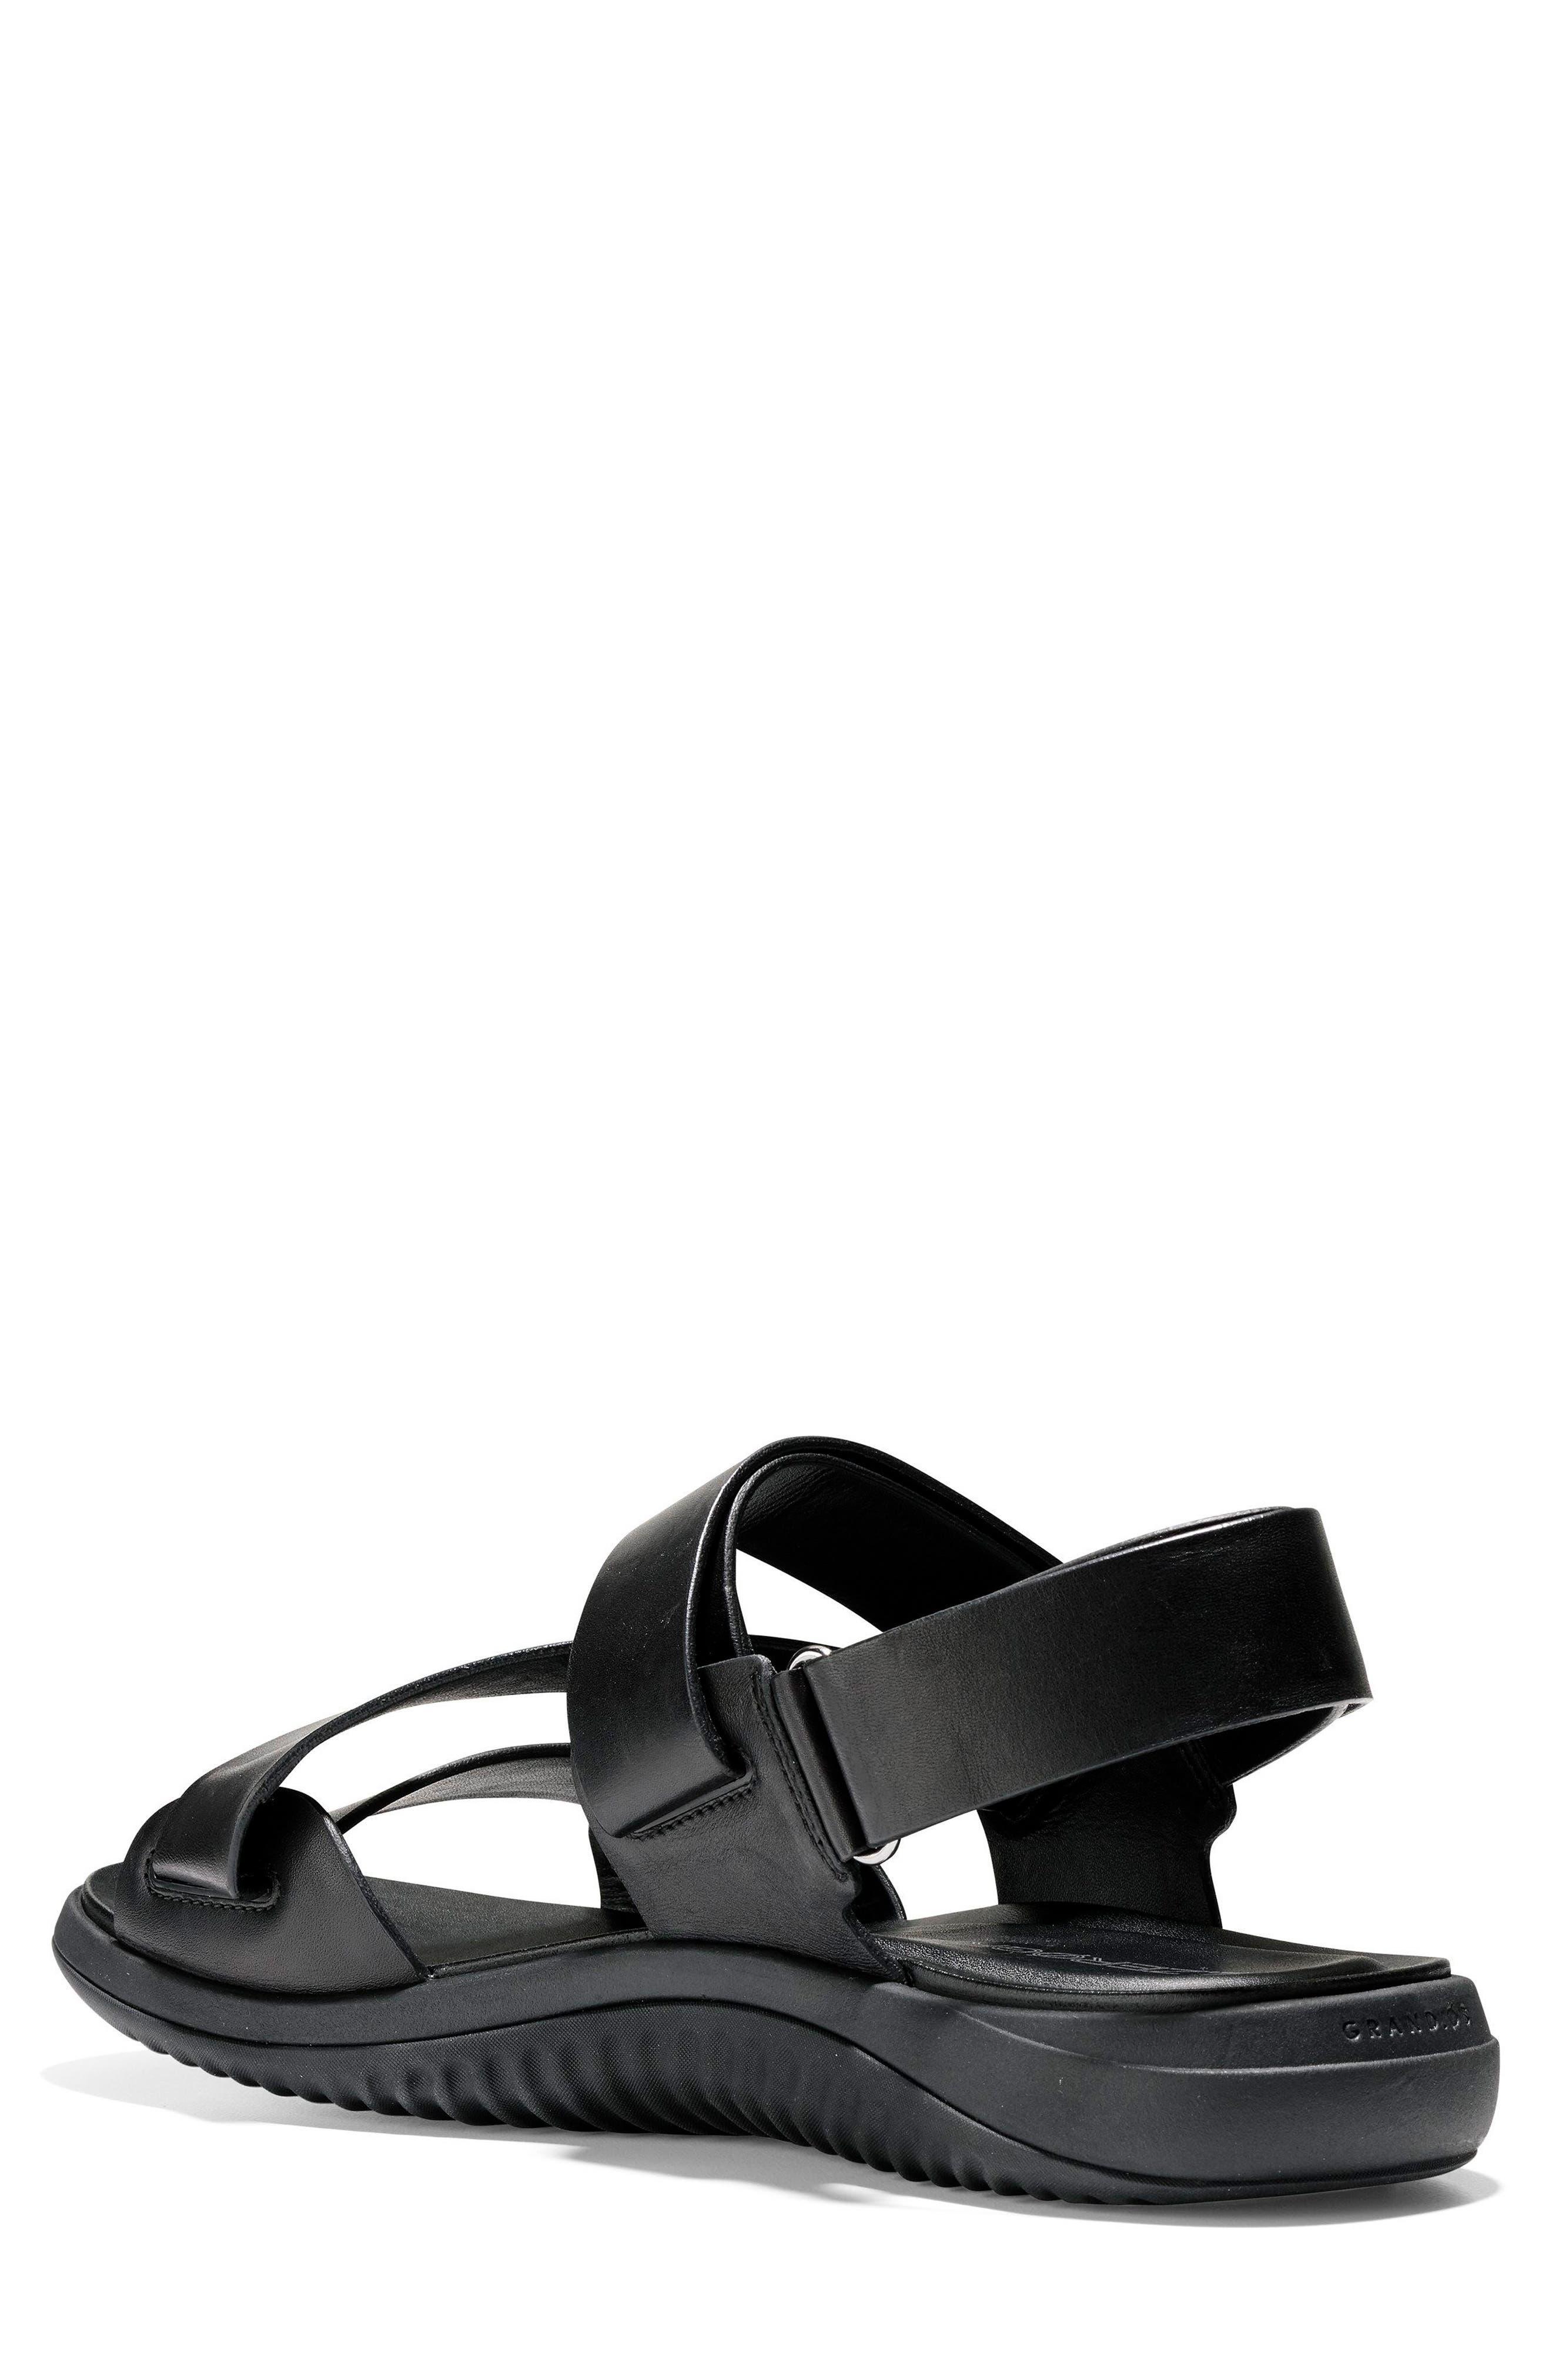 2.ZeroGrand Multistrap Sandal,                             Alternate thumbnail 2, color,                             003